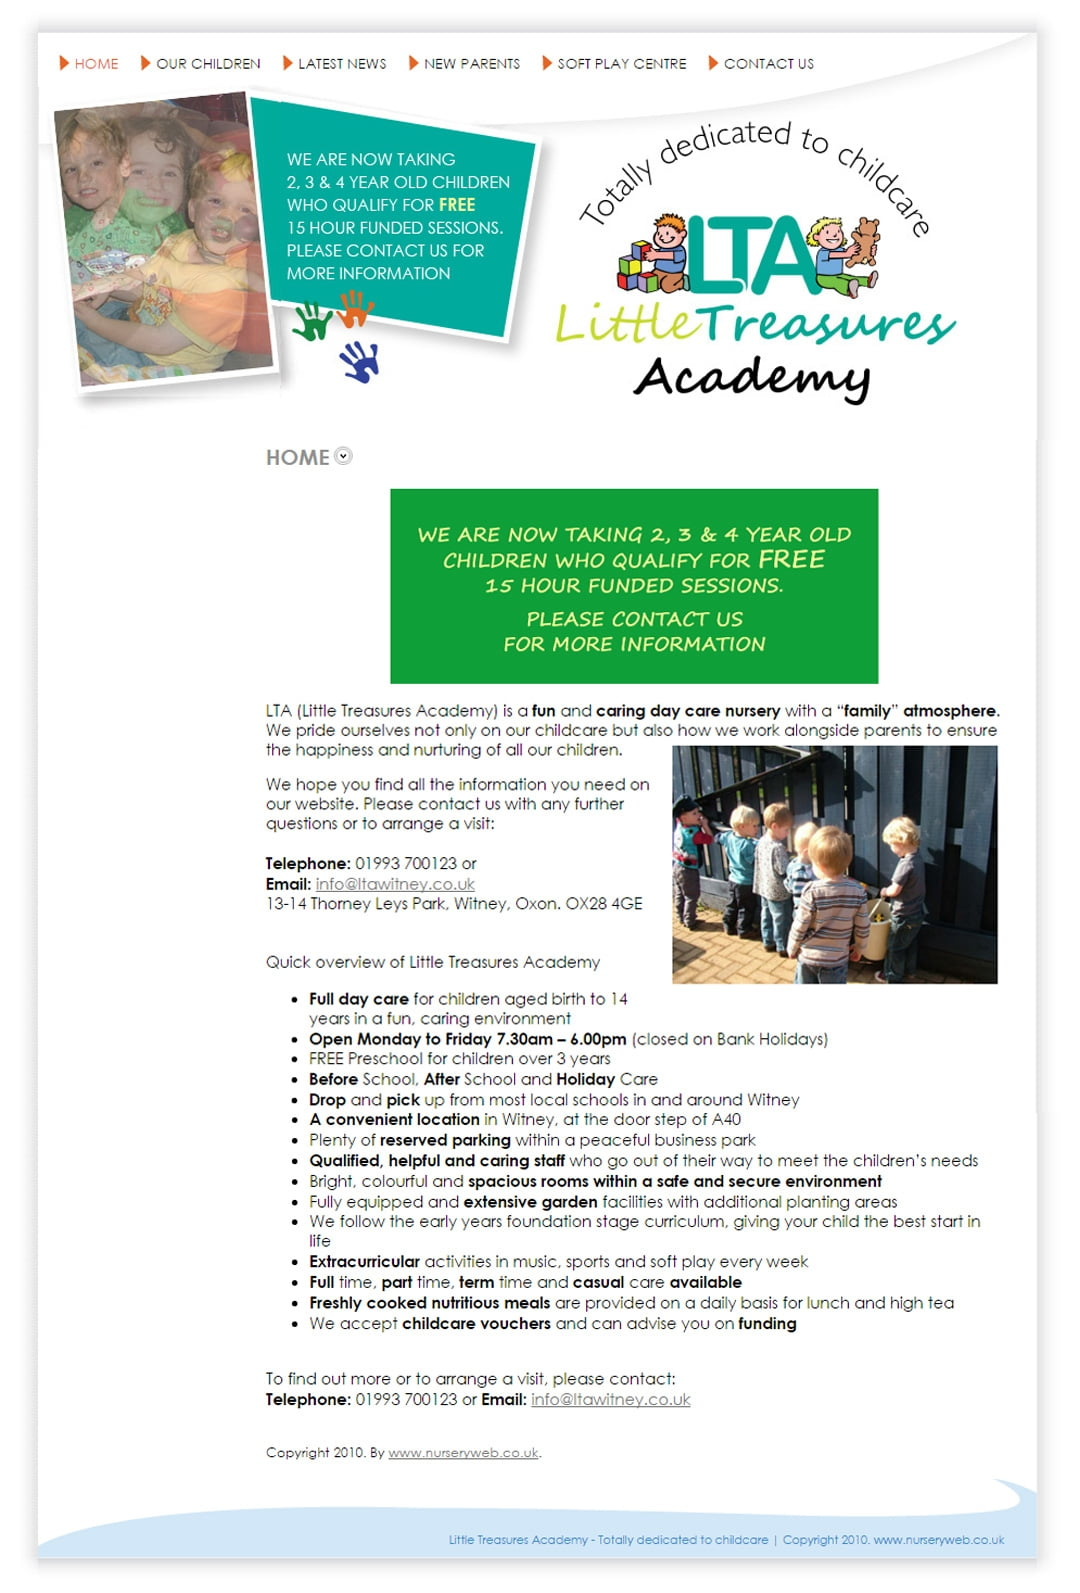 Little Treasures Academy